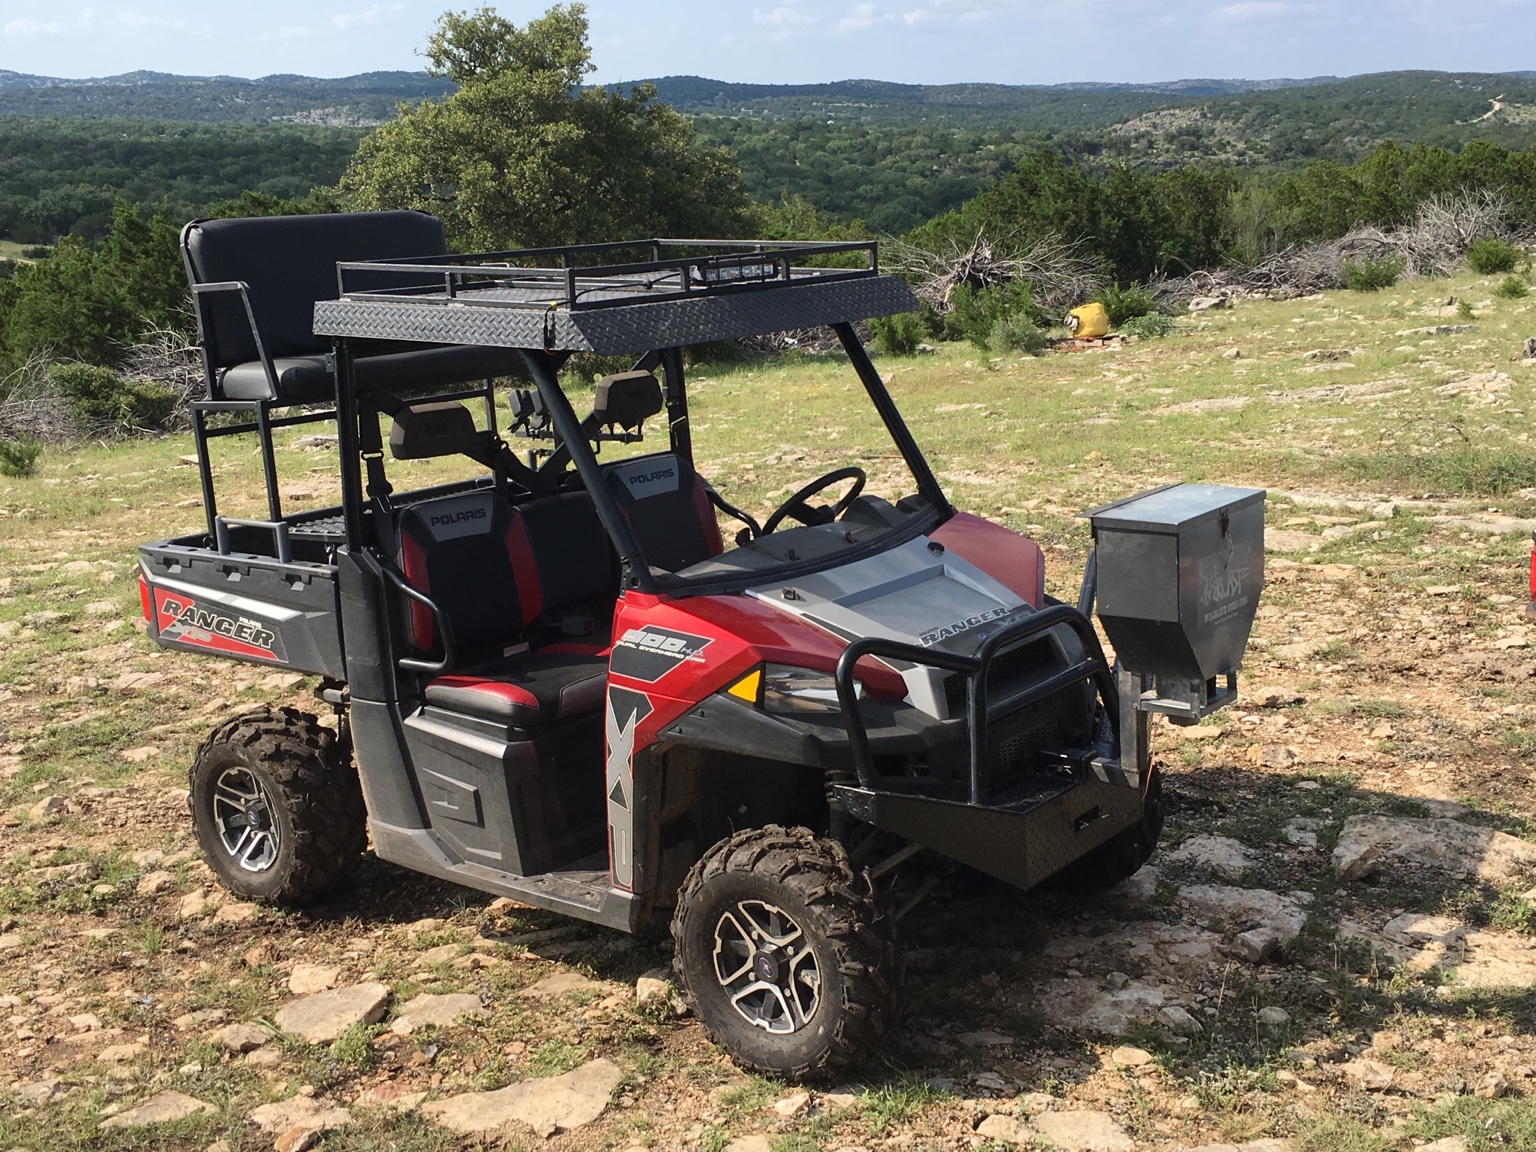 2016 900xp Bumper Options Rangerforums Net Polaris